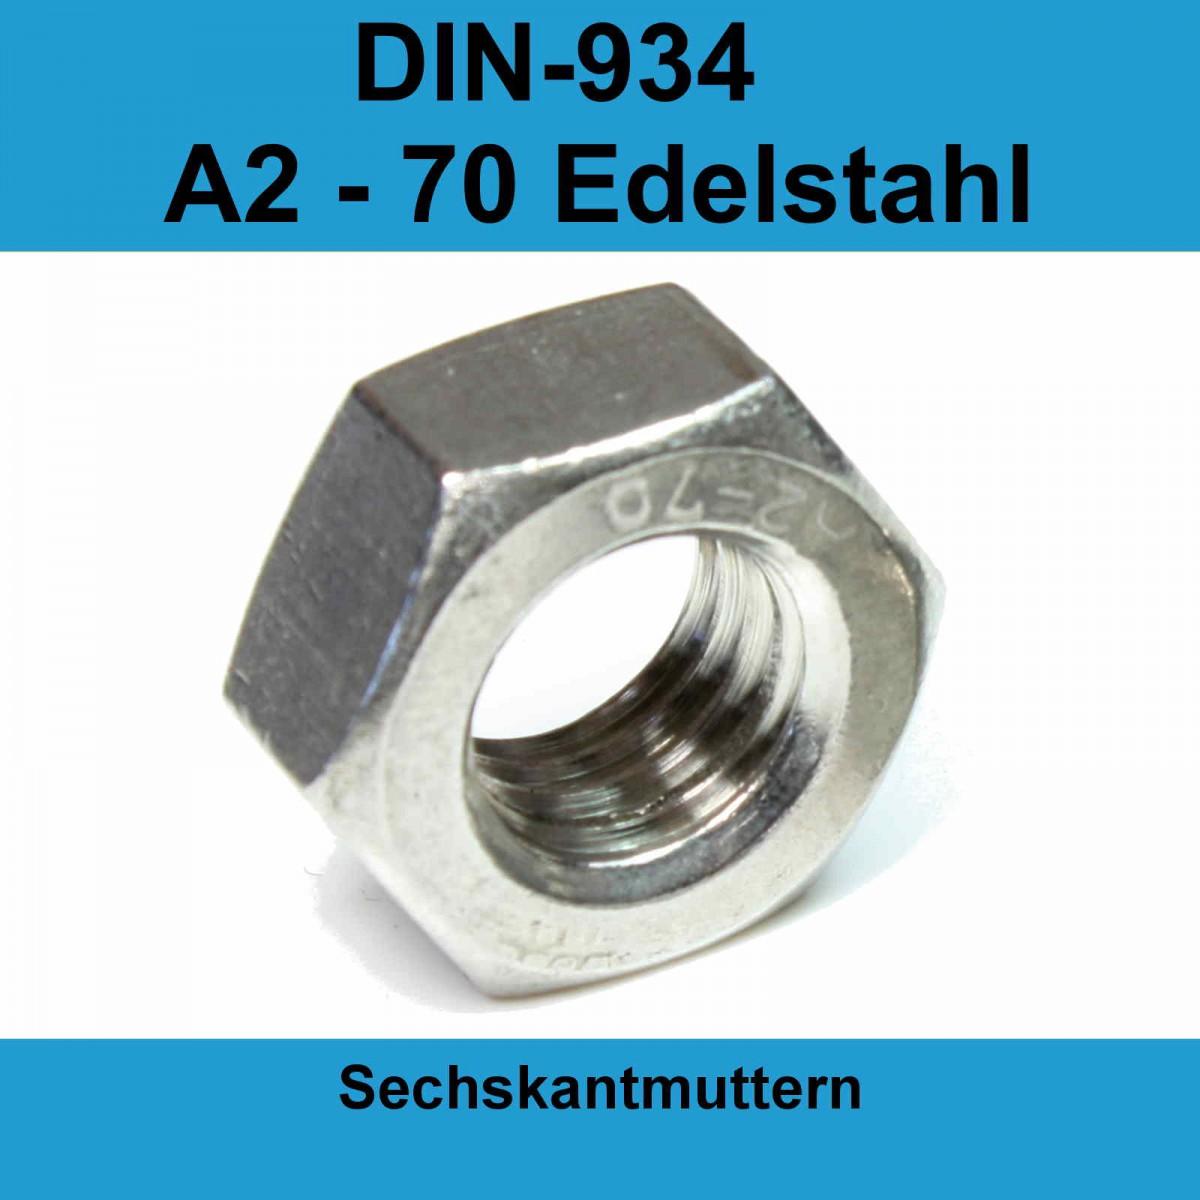 1000 Stück Sechskantmuttern  DIN 934 Linksgewinde Edelstahl A2-70 M 5